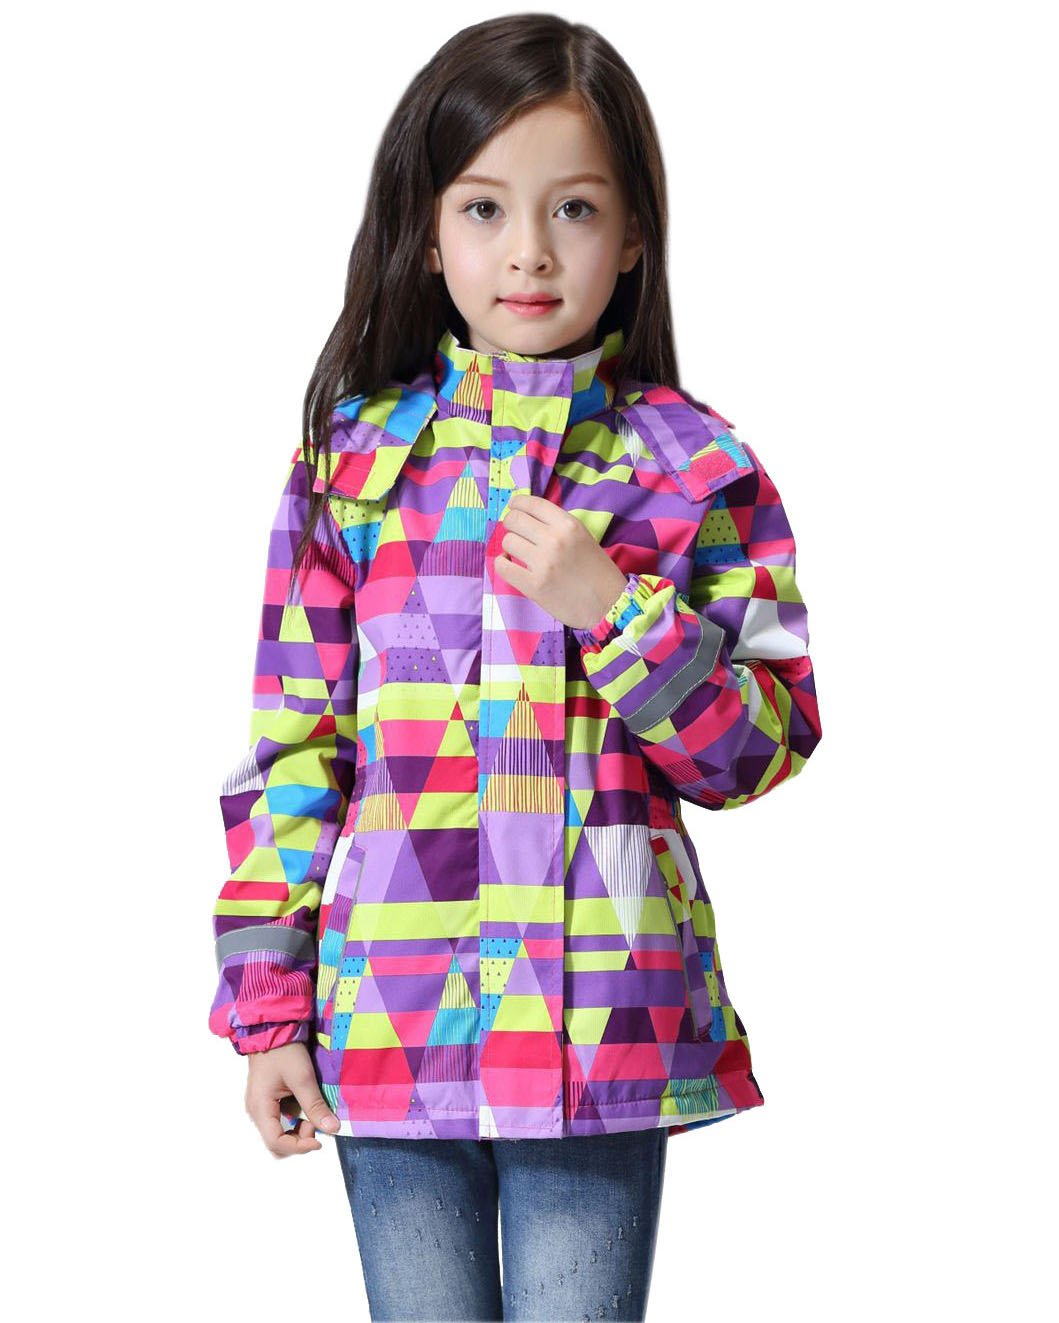 Senco-Girls Girls Windbreaker with Hood Fleece Liner Jacket for Kids Outdoor Winter Outerwear Sports Coat